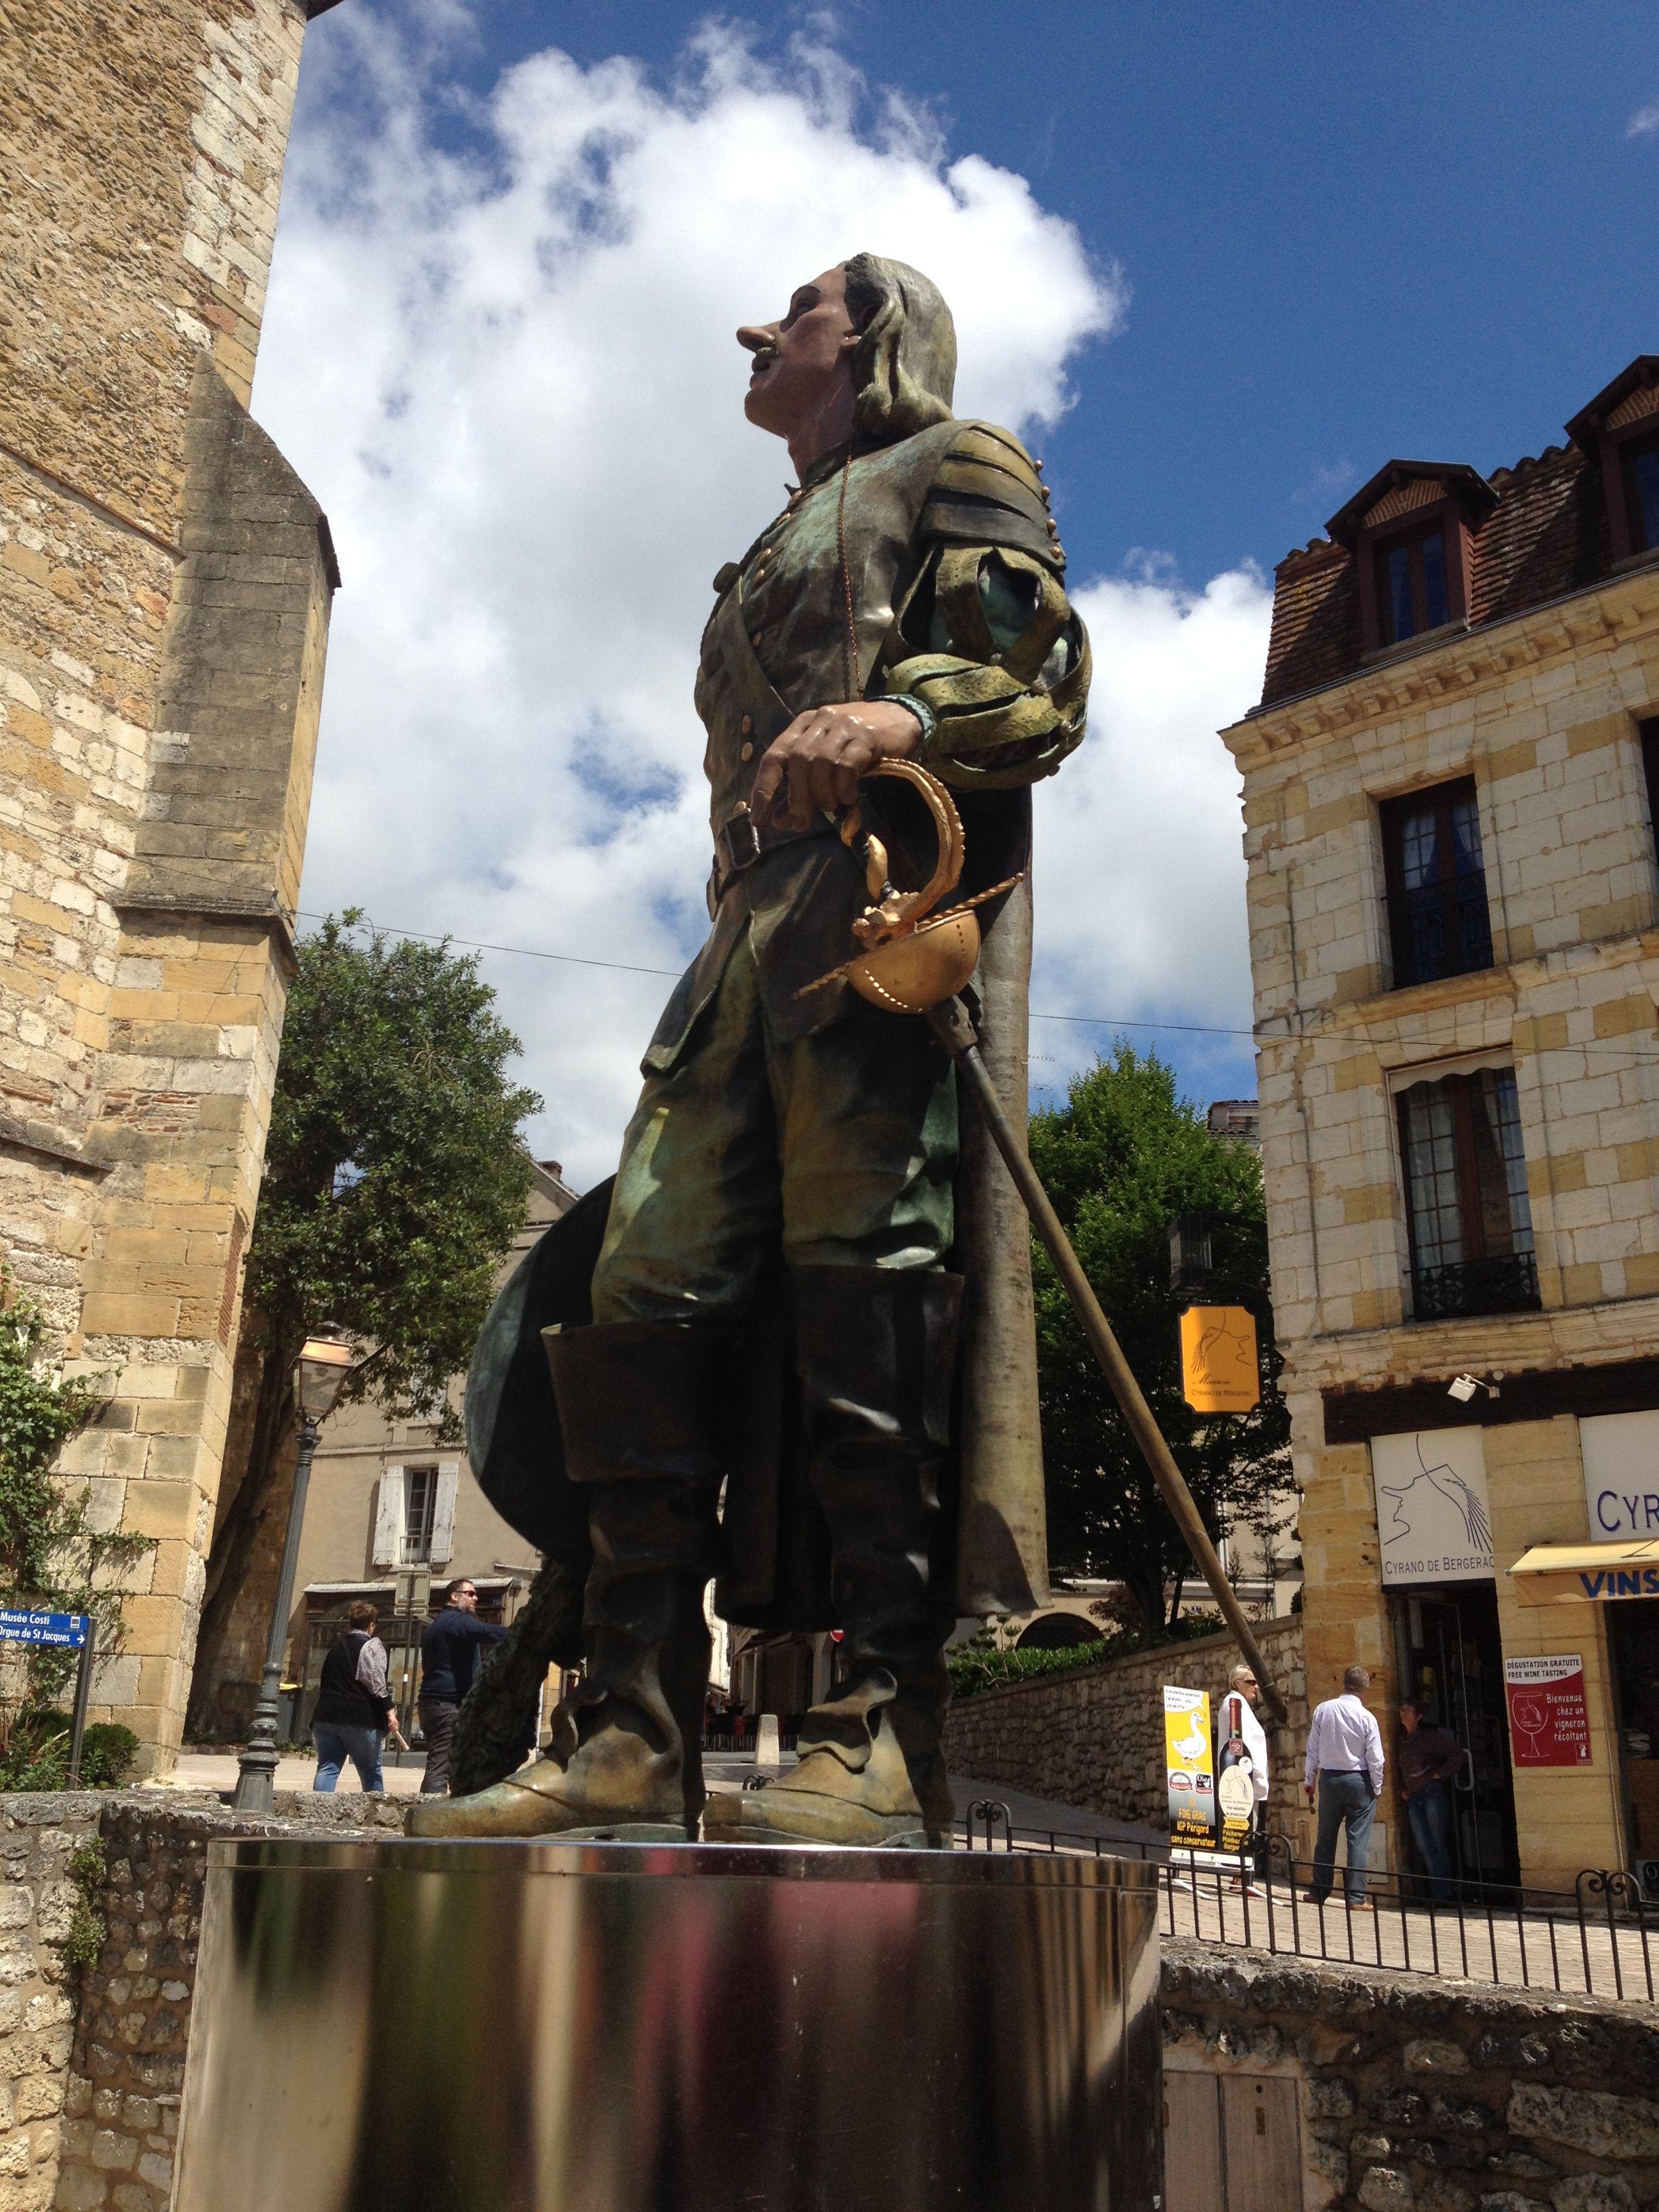 Cyrano de bergerac statue bergerac france dordogne - La douche perigueux ...